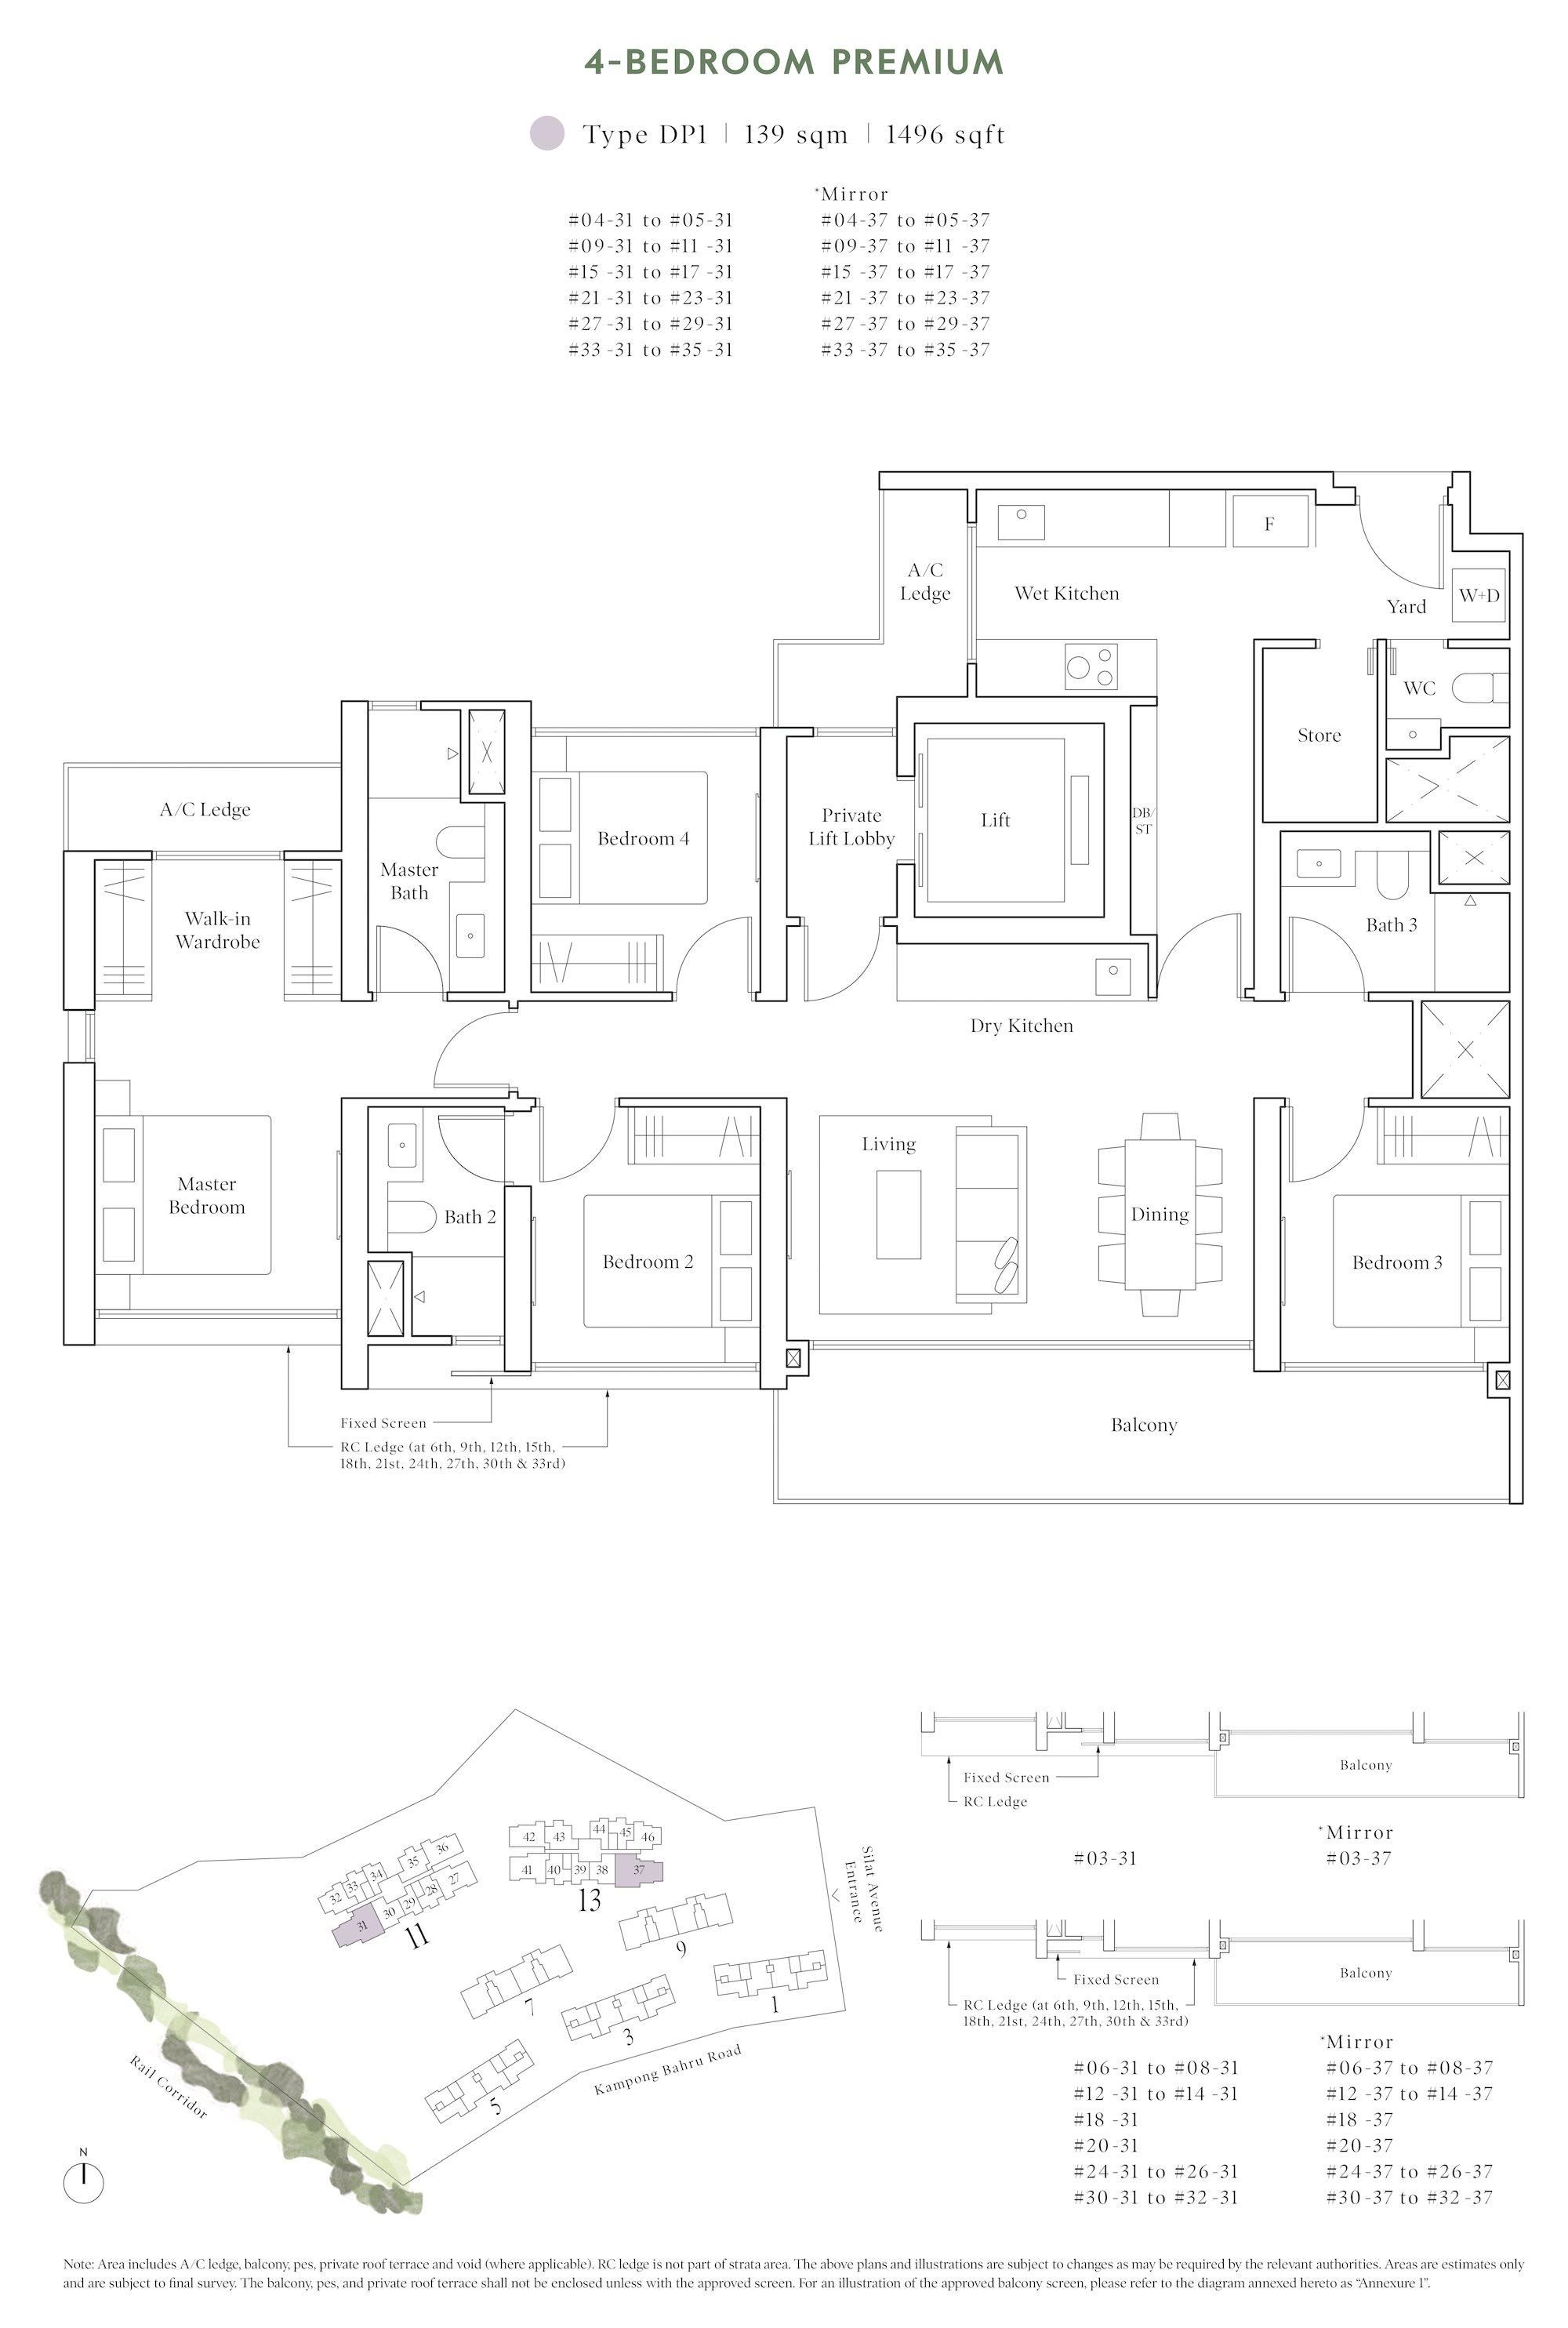 Avenue South Residence 南峰雅苑 horizon floor plan 4-bedroom premium dp1